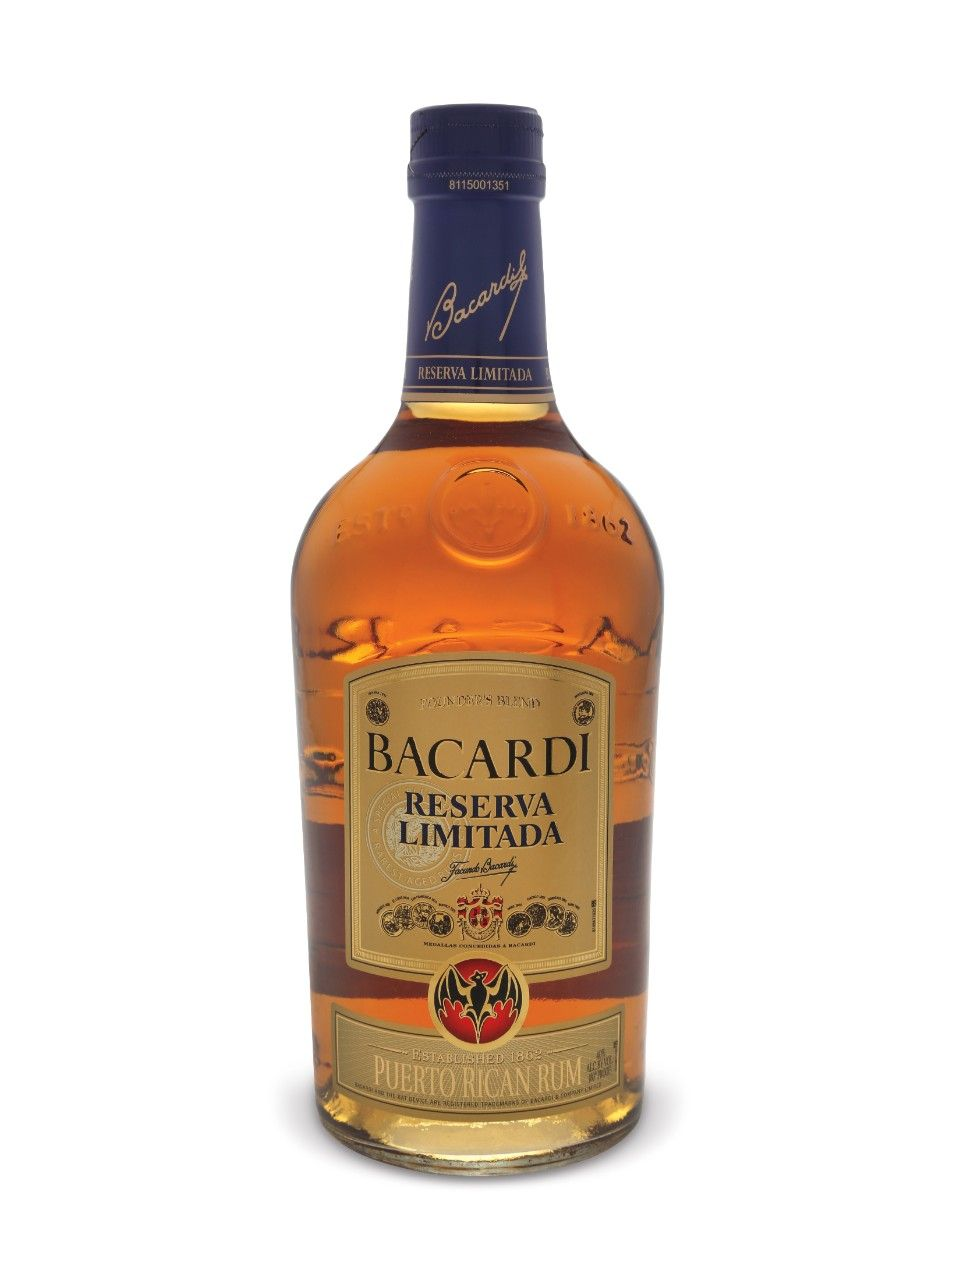 Rum and bacardi